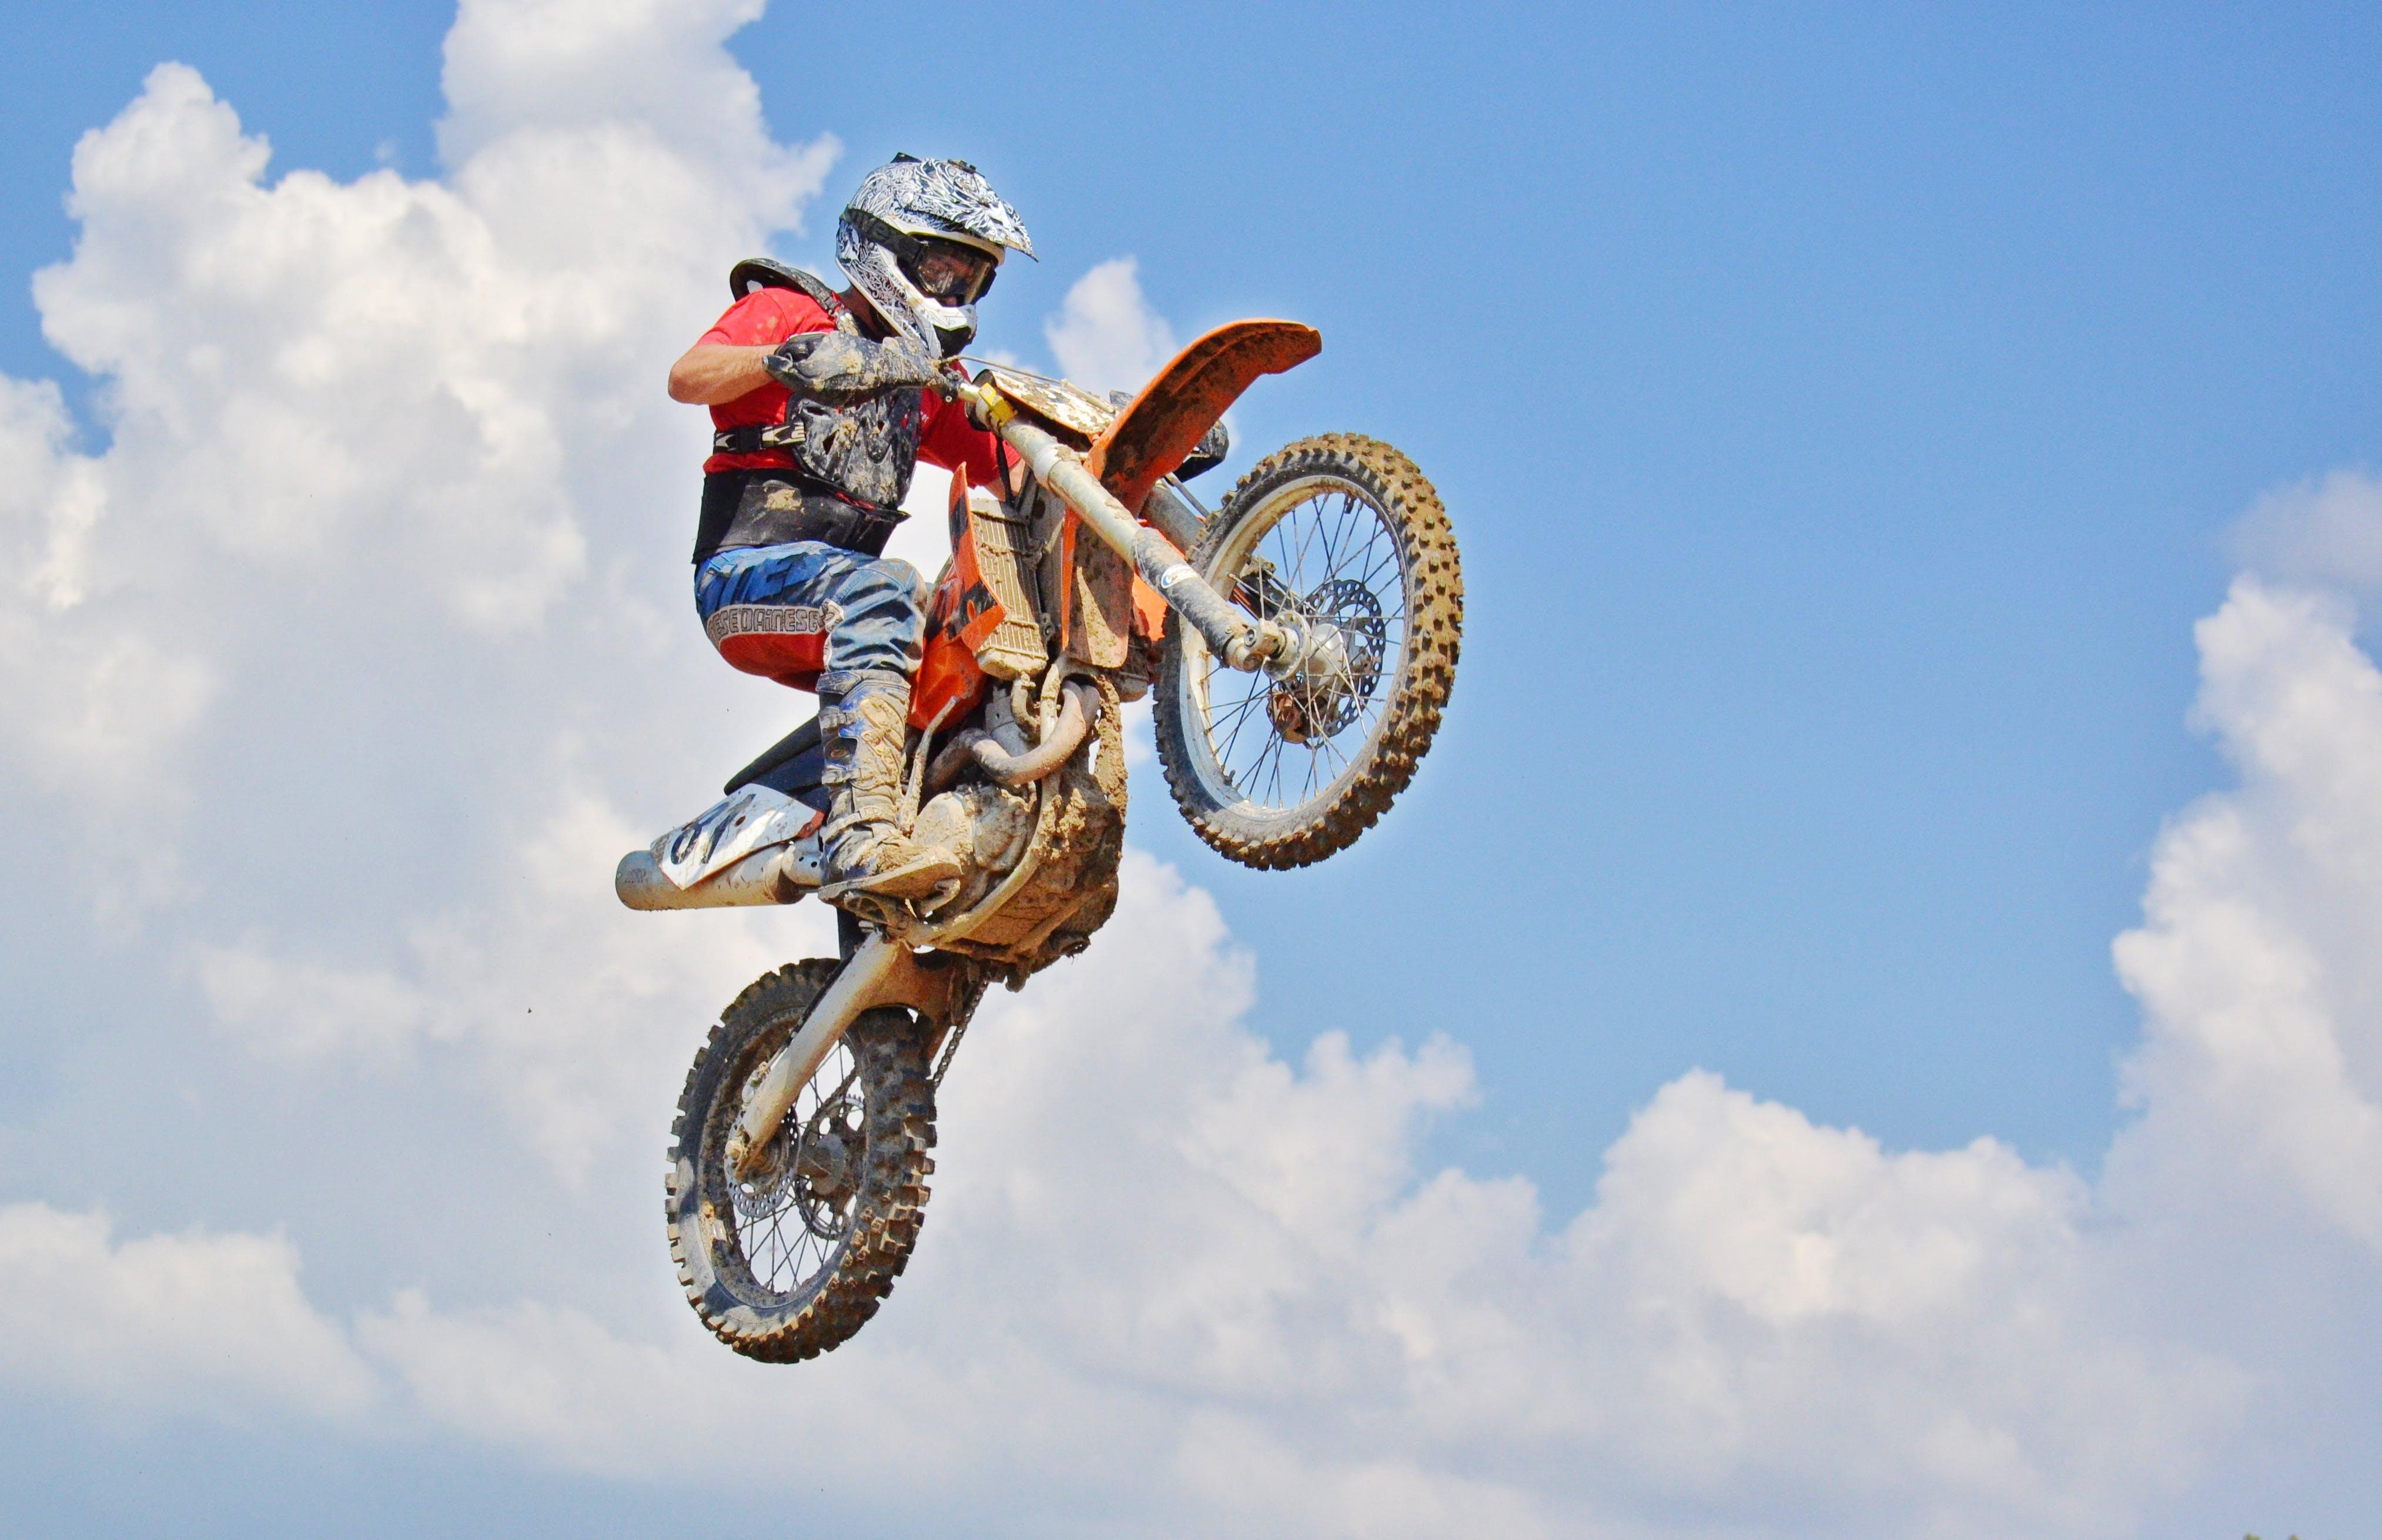 Man On A Motocross Dirt Bike